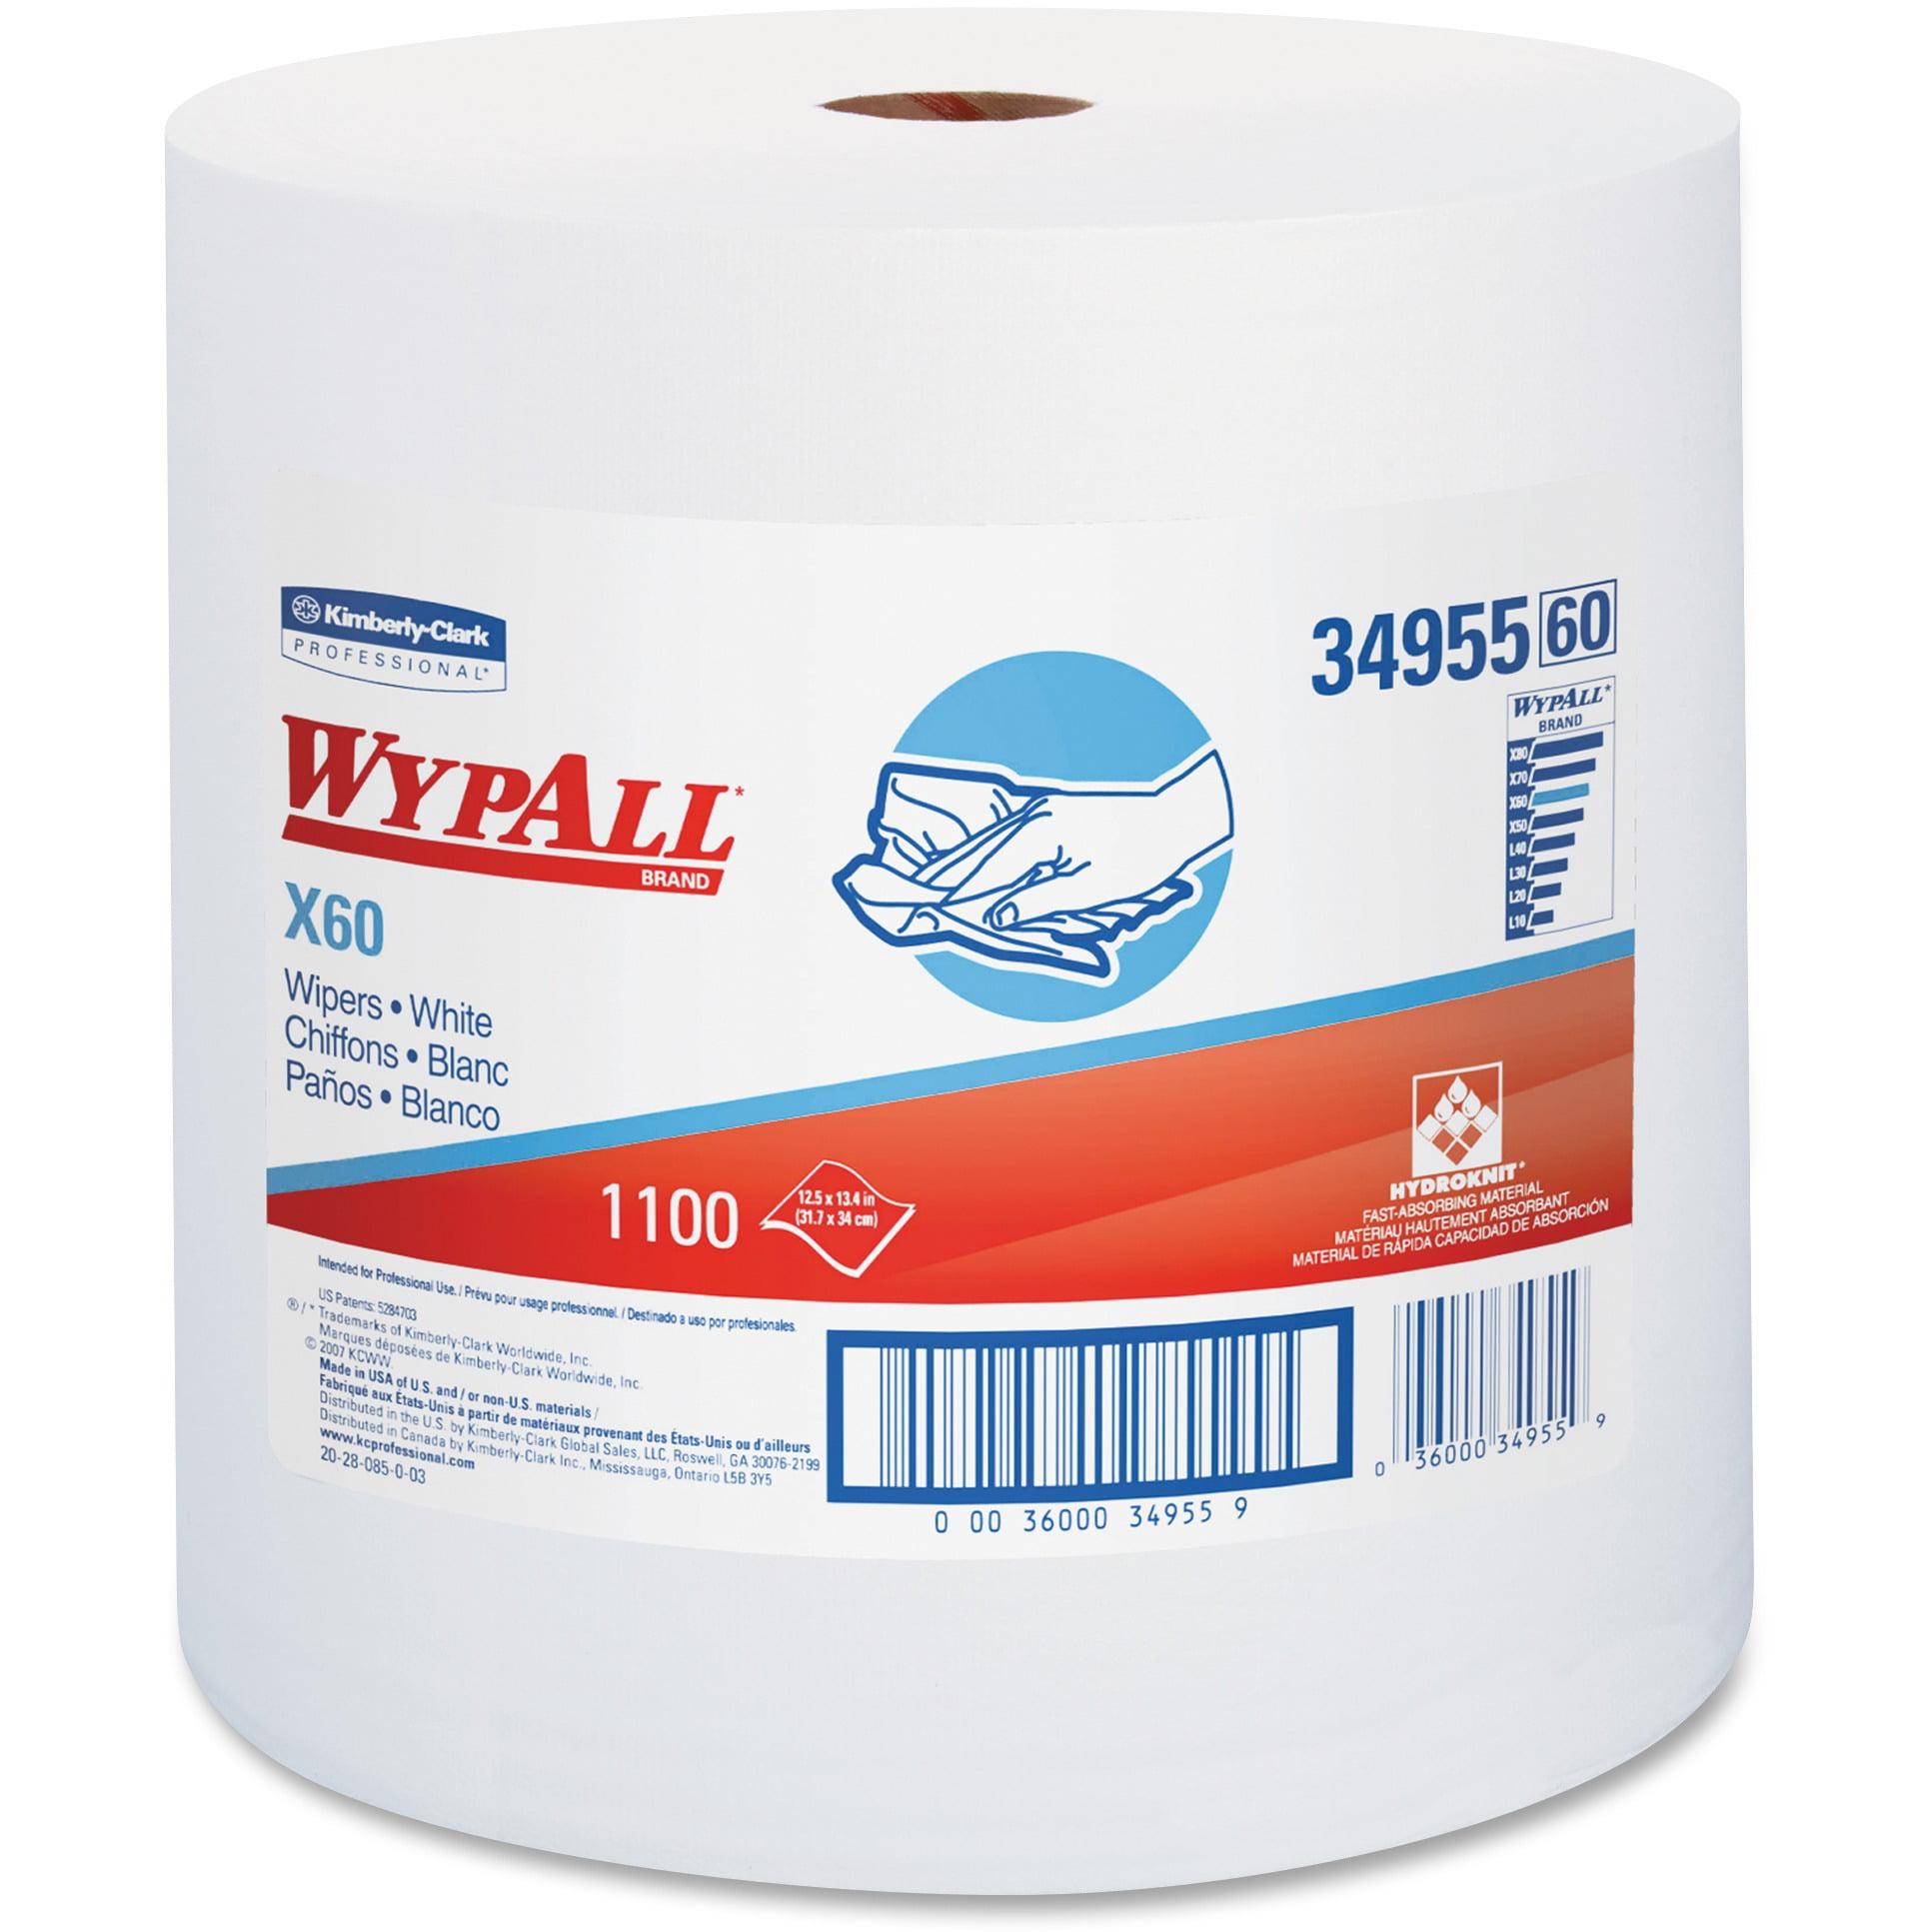 Wypall, KCC34955, X60 Wipers Jumbo Roll, 1100 / Carton, White